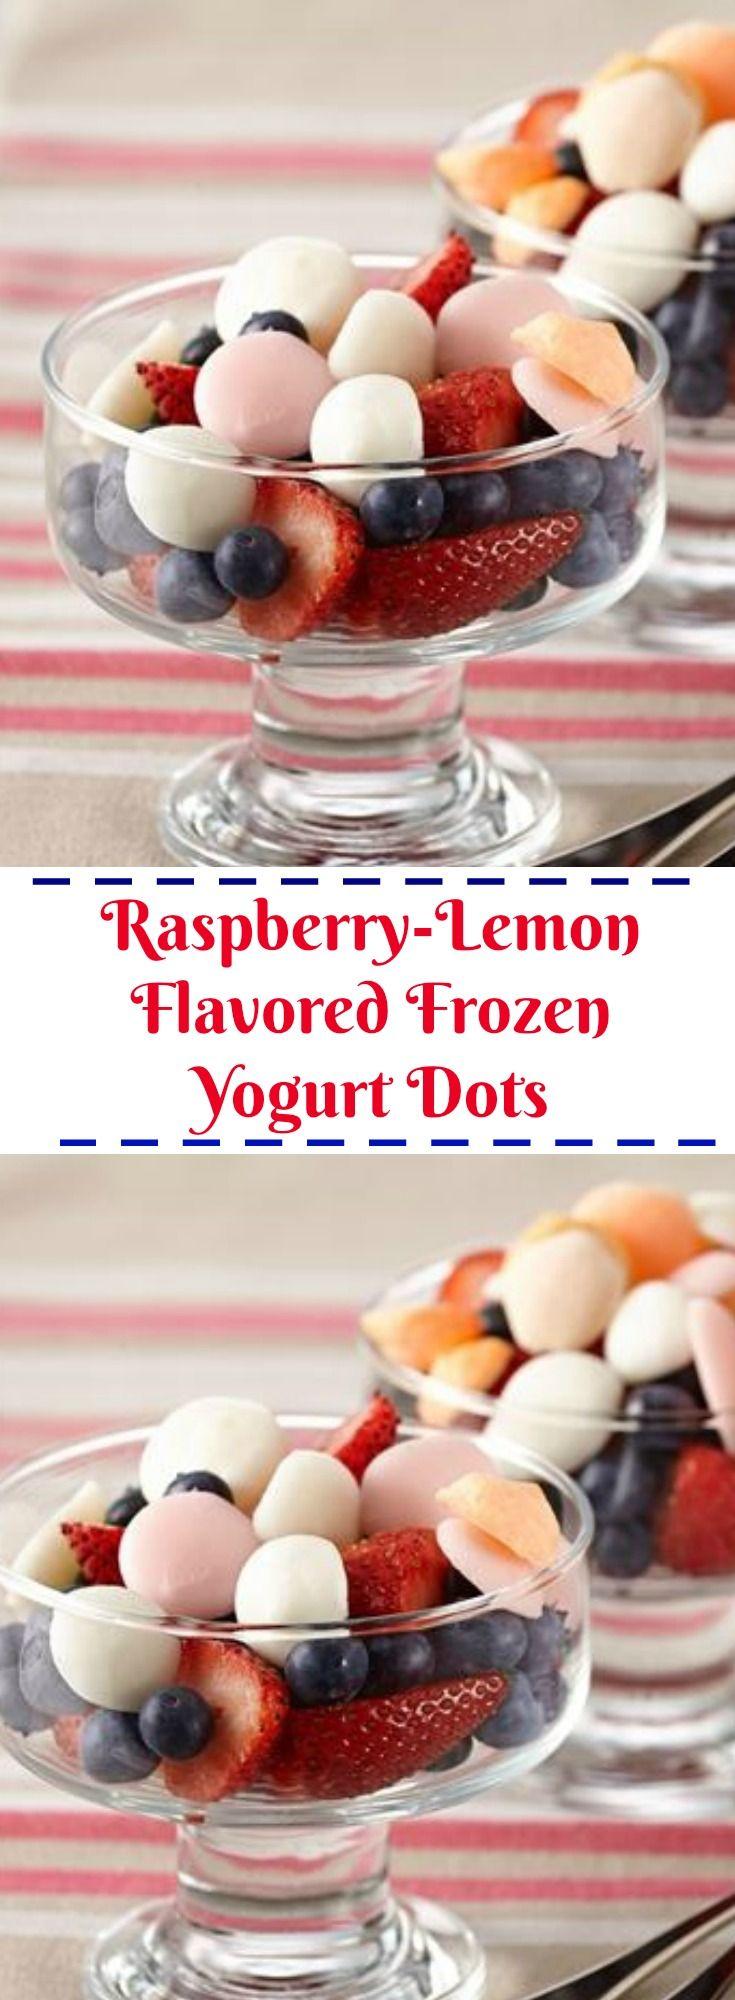 Raspberry-Lemon Flavored Frozen Yogurt Dots